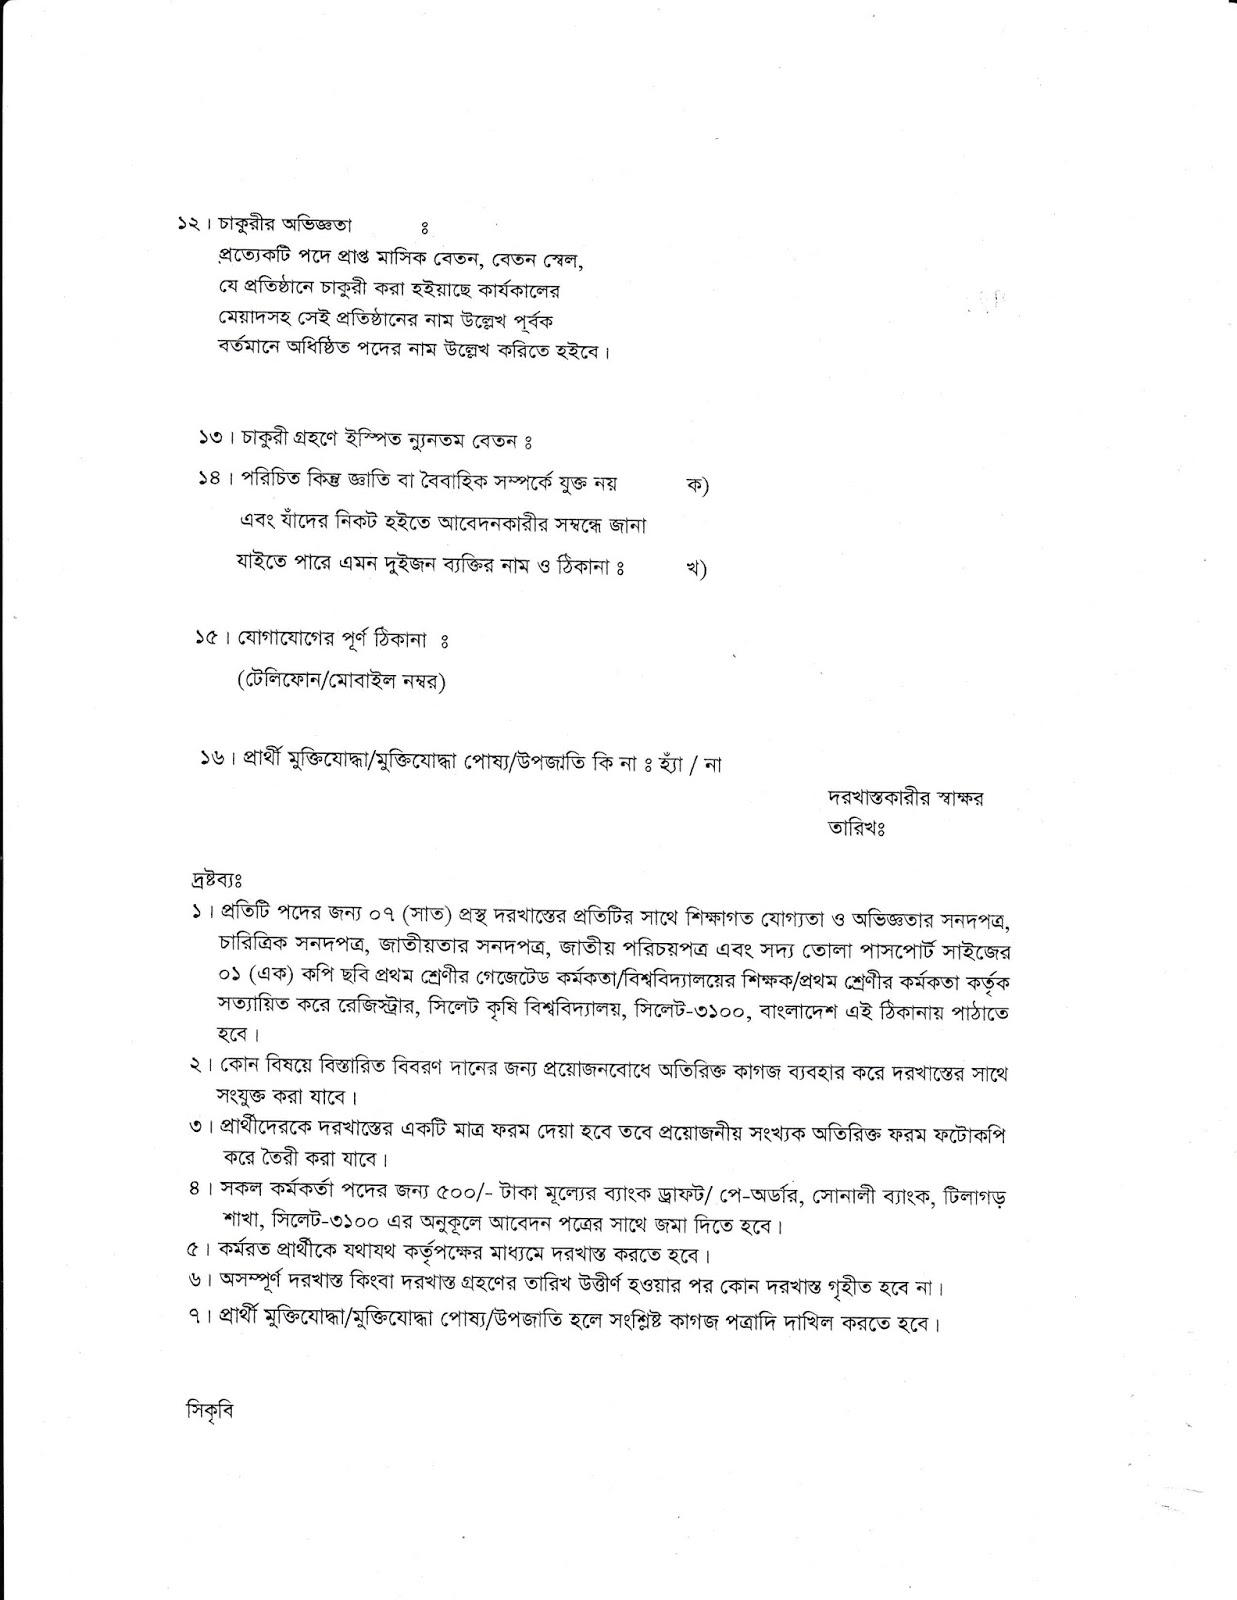 Sylhet Agricultural University (SAU) Application Form